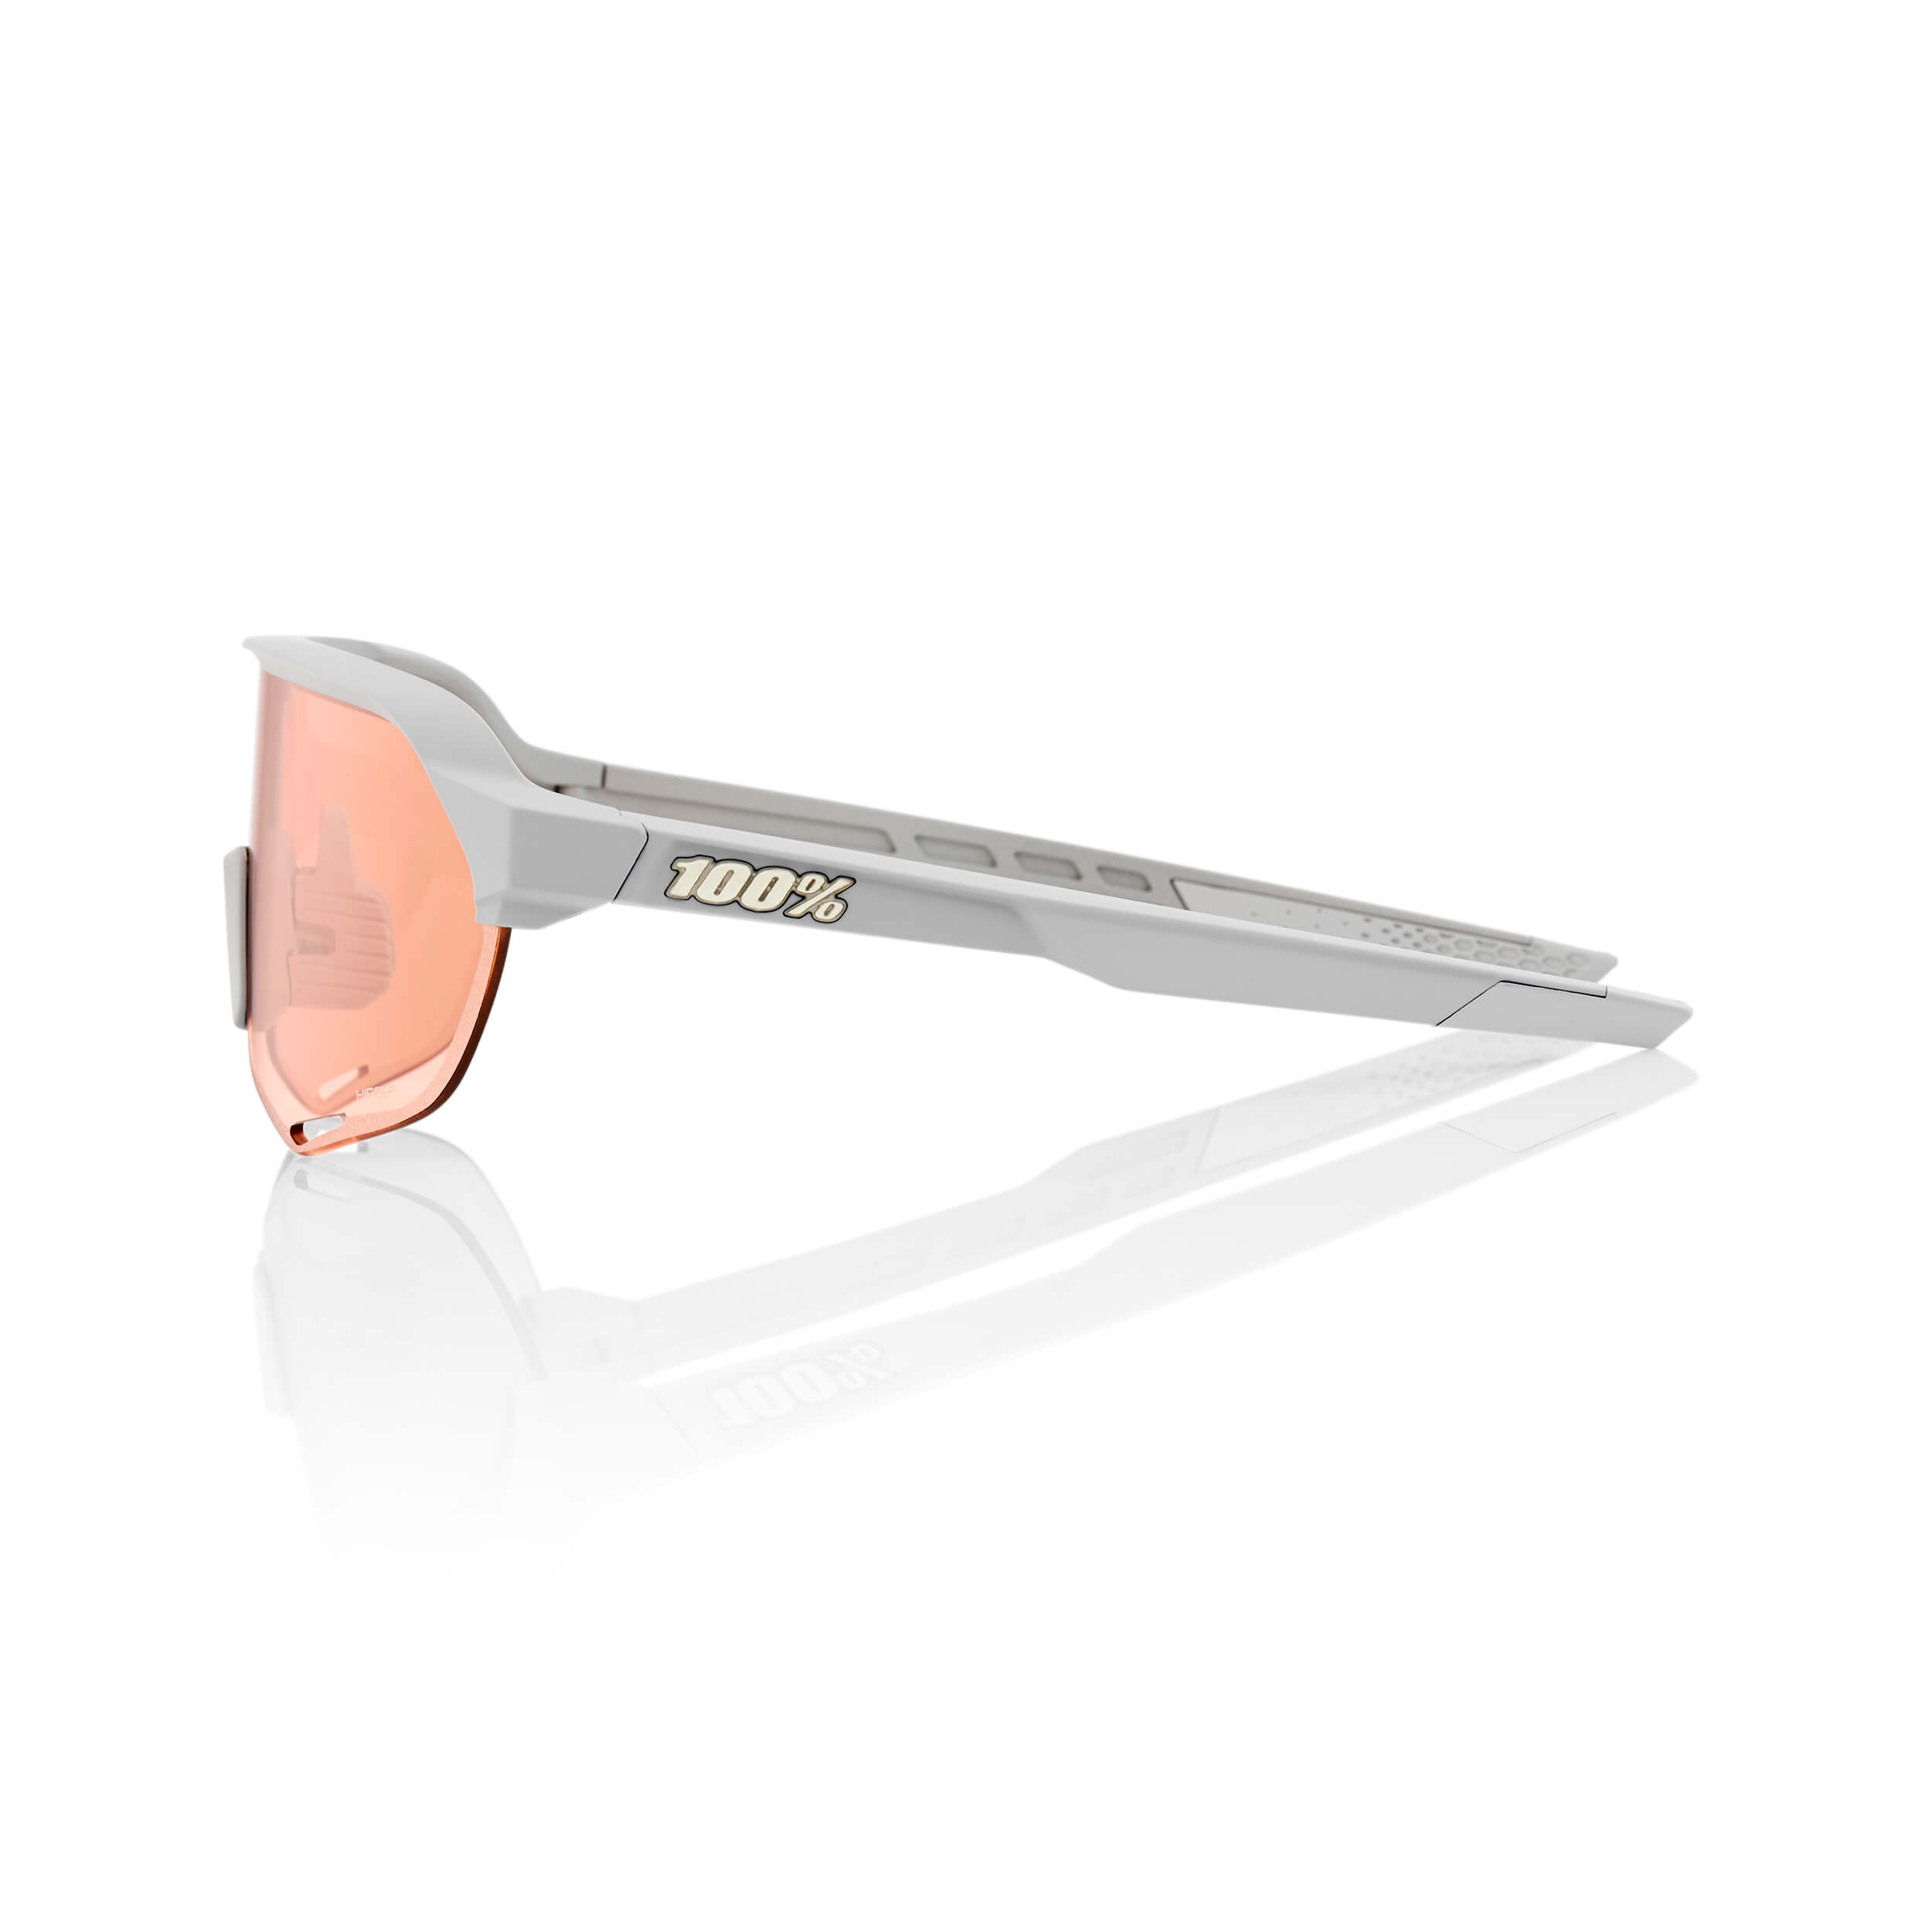 S2 – Soft Tact Stone Grey – HiPER Coral Lens